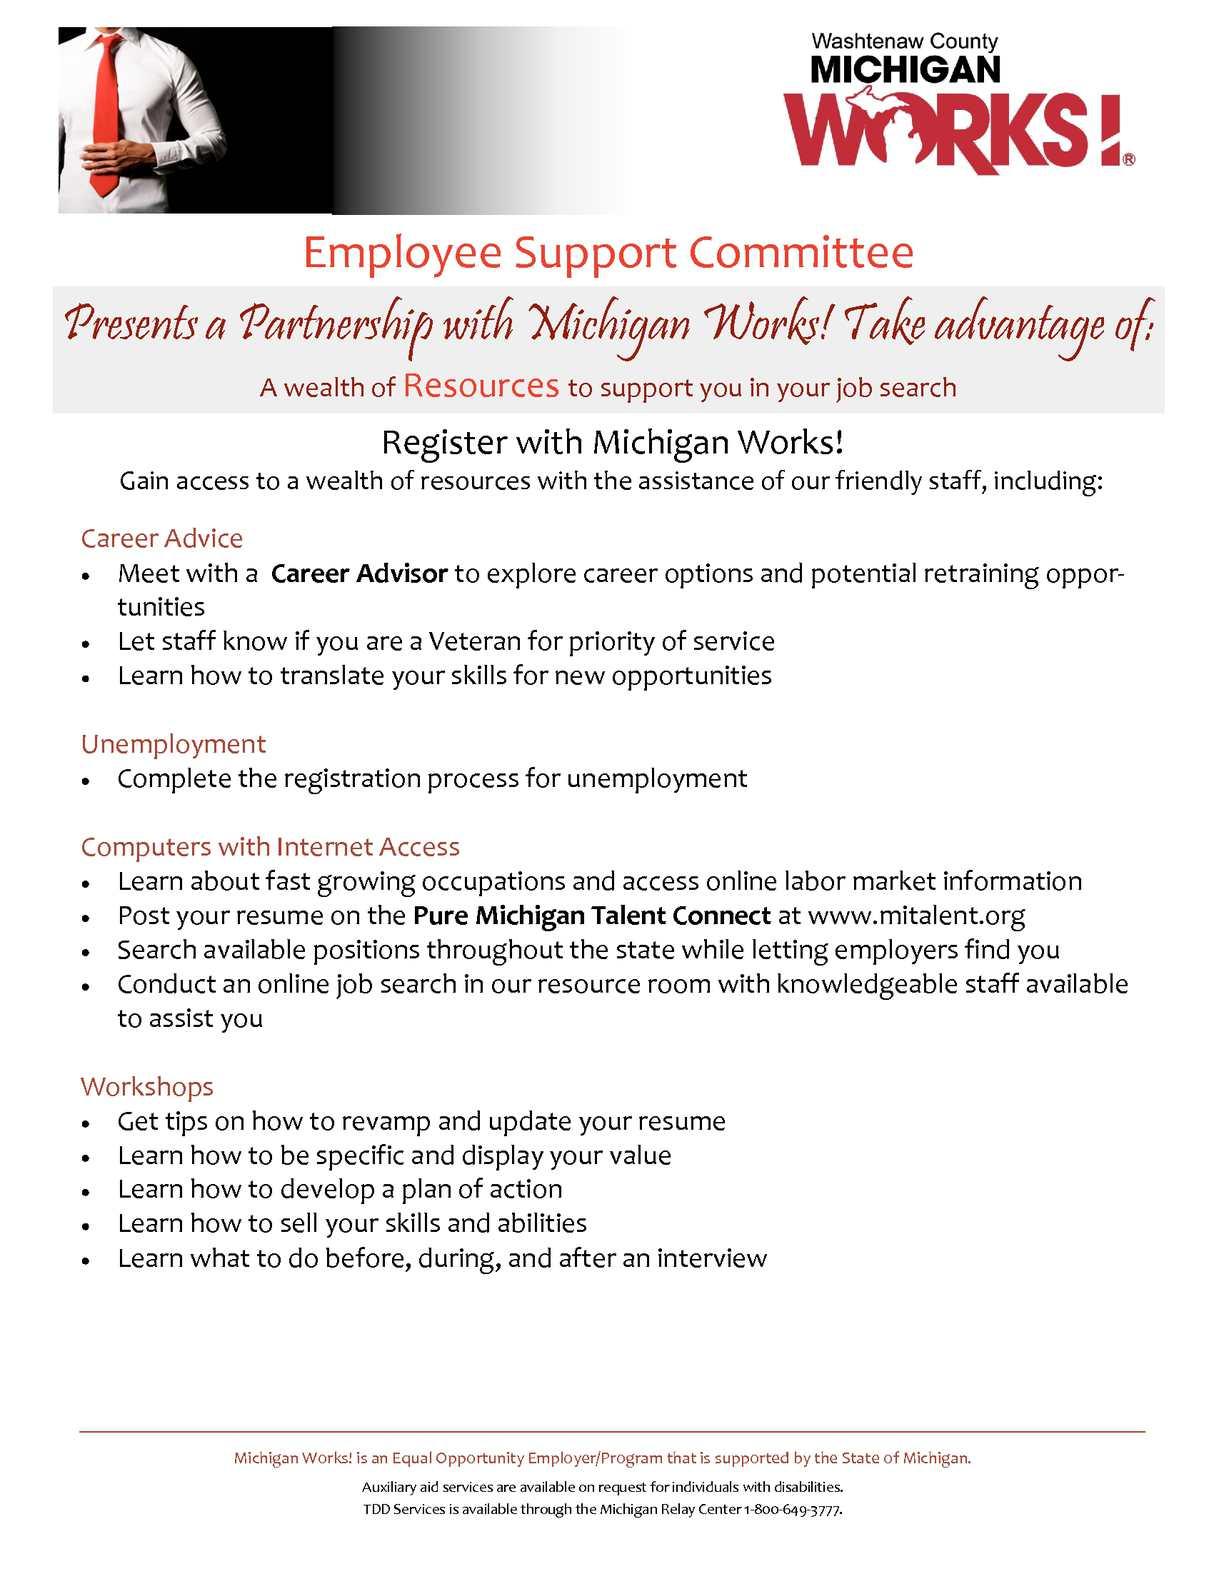 Michigan Works Resume.Calameo Michigan Works Employee Support Committee